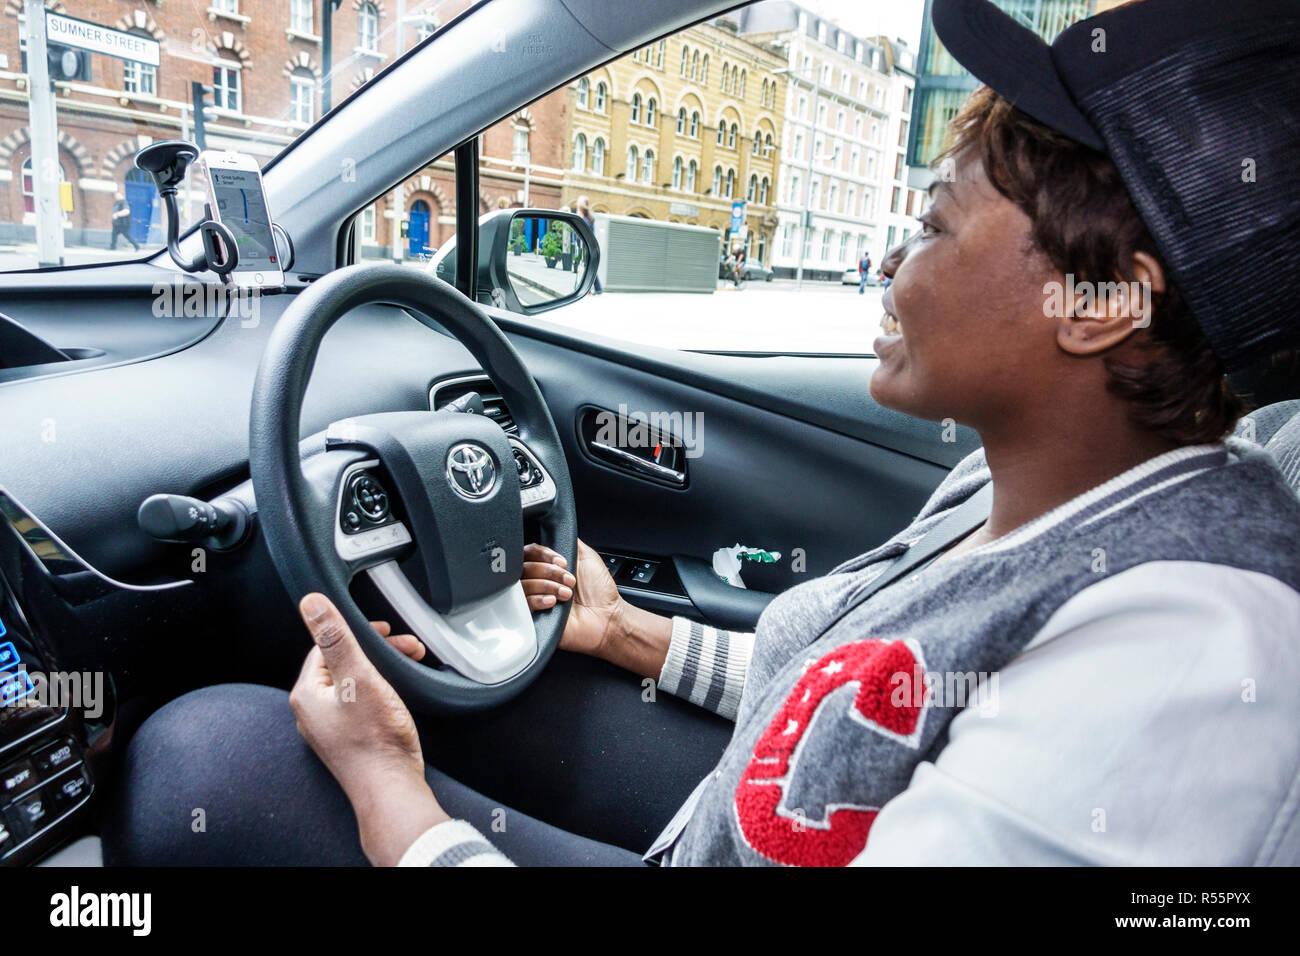 United Kingdom Great Britain England London Southwark uber driver driving car interior inside steering wheel Black woman working - Stock Image